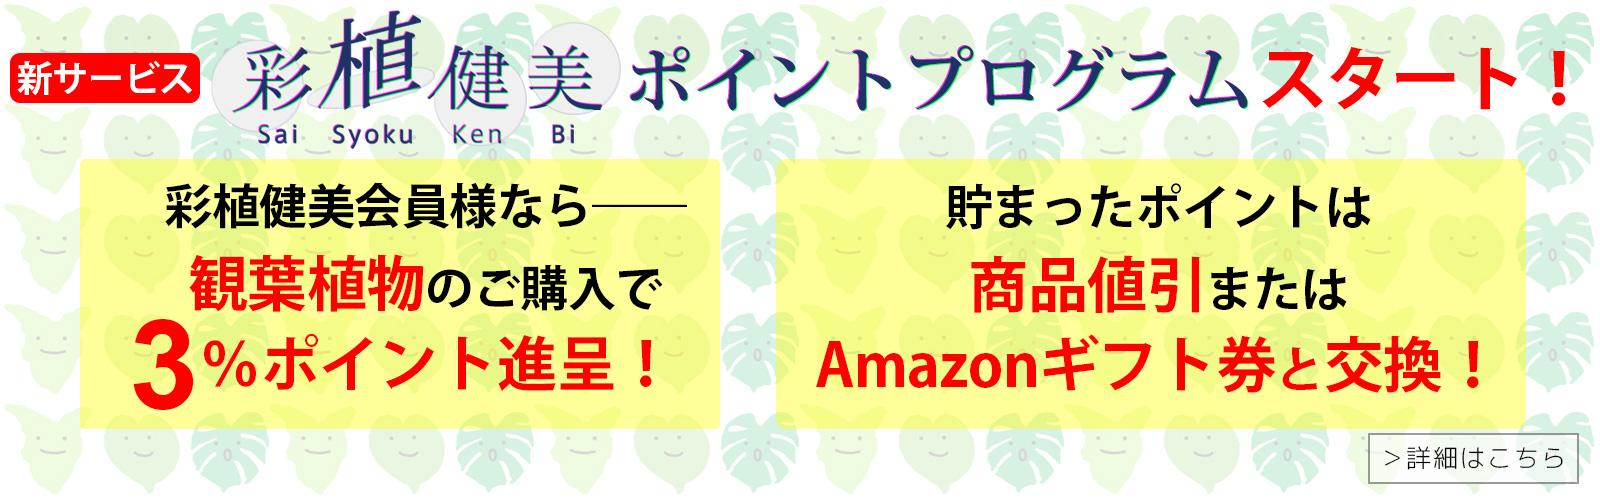 /top_03_08.jpg